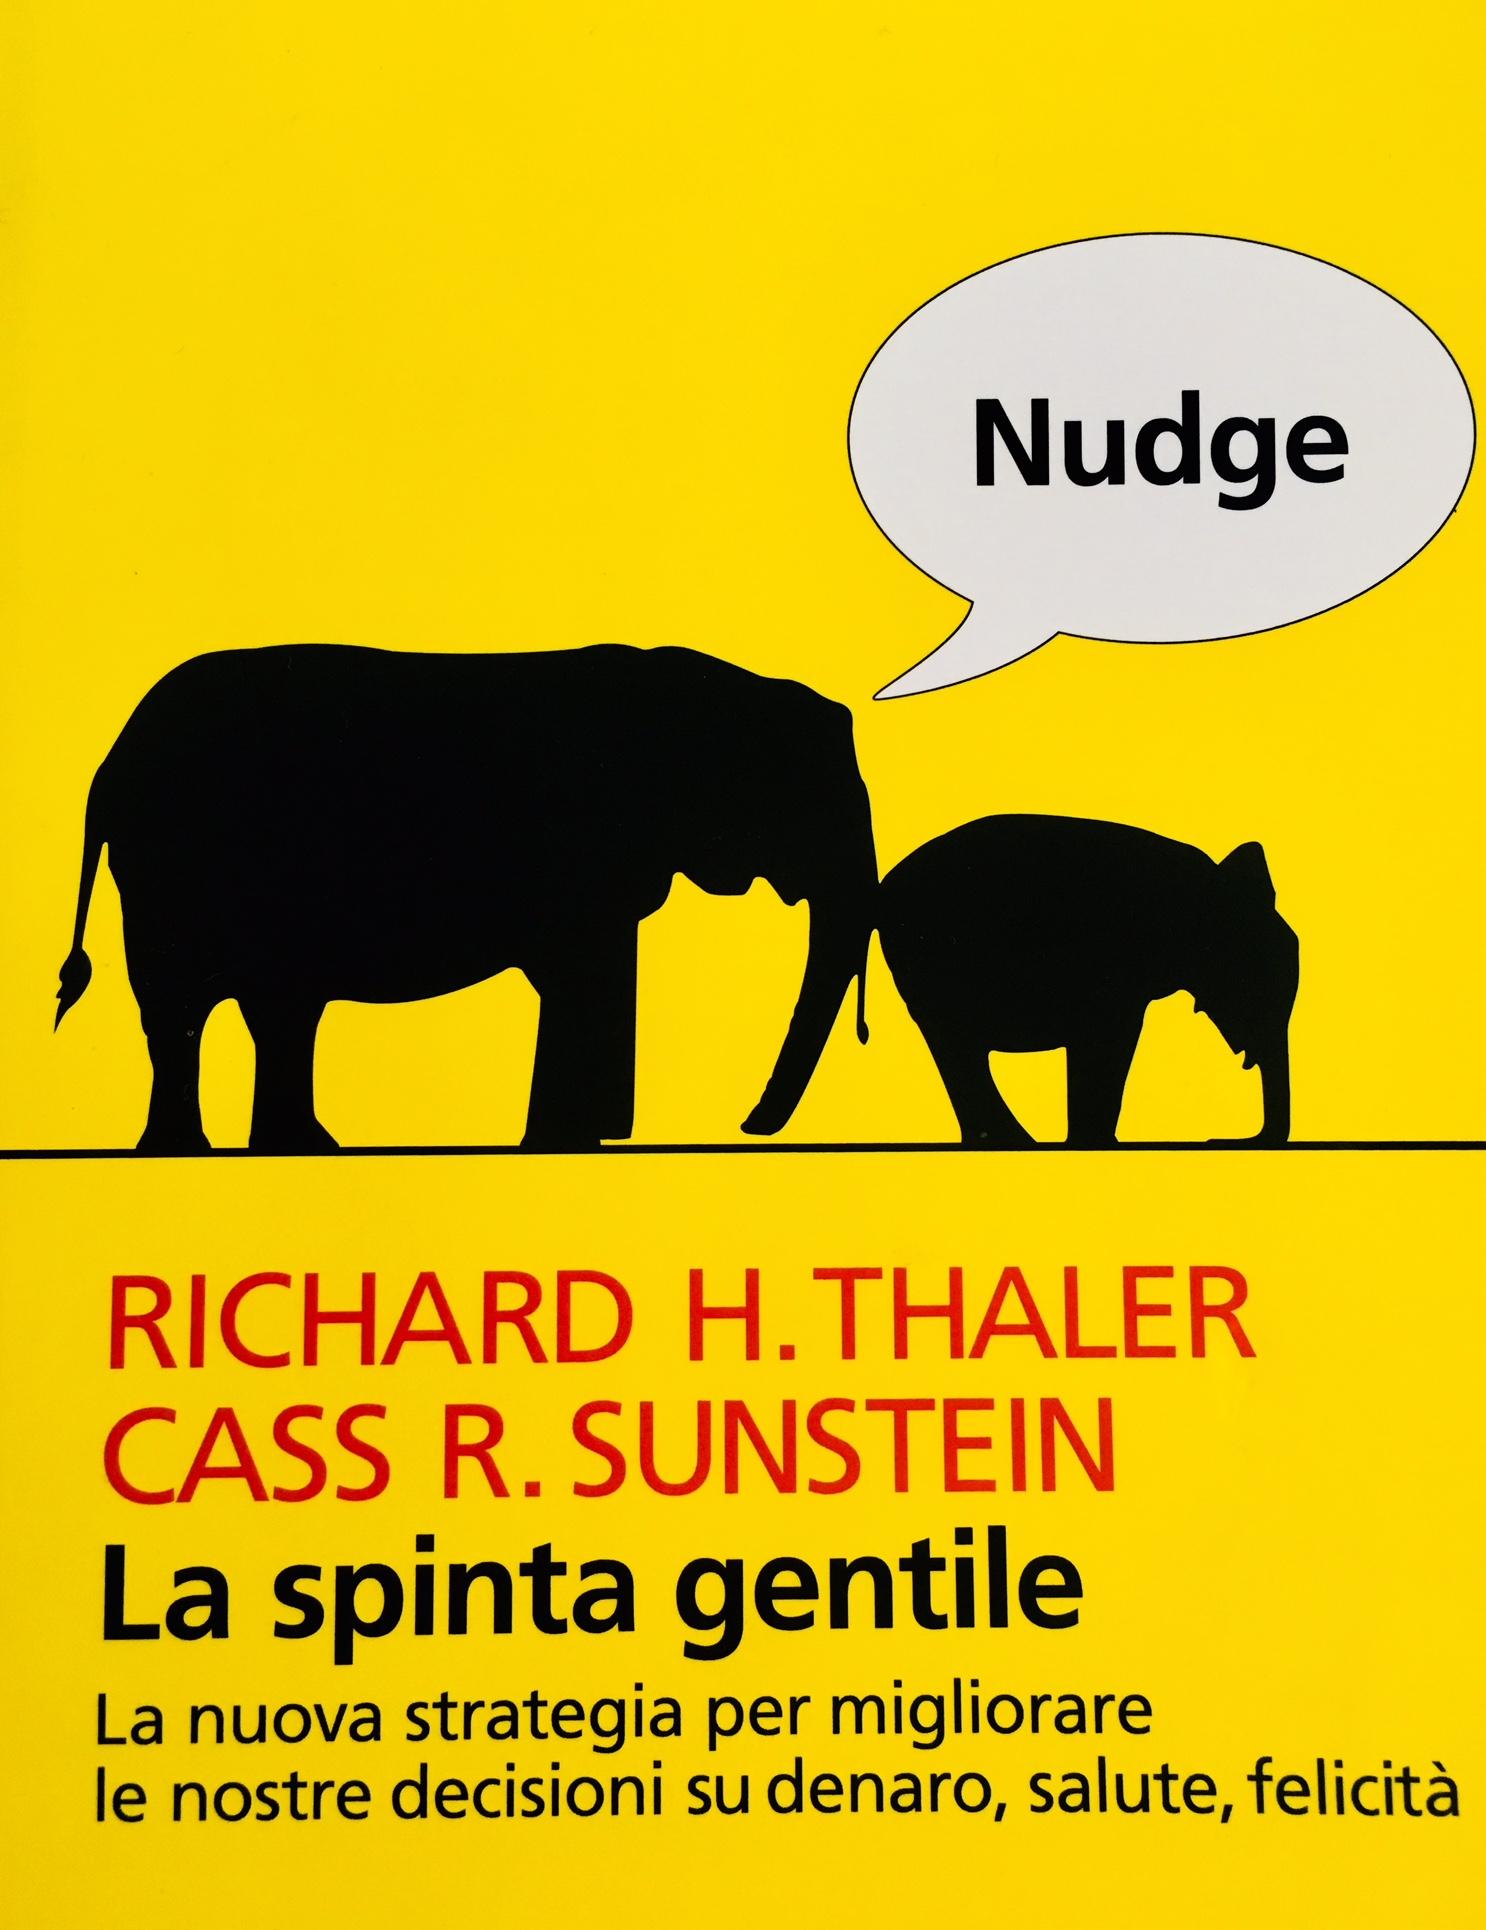 Richard Thaler Nudge la spinta gentile.jpg